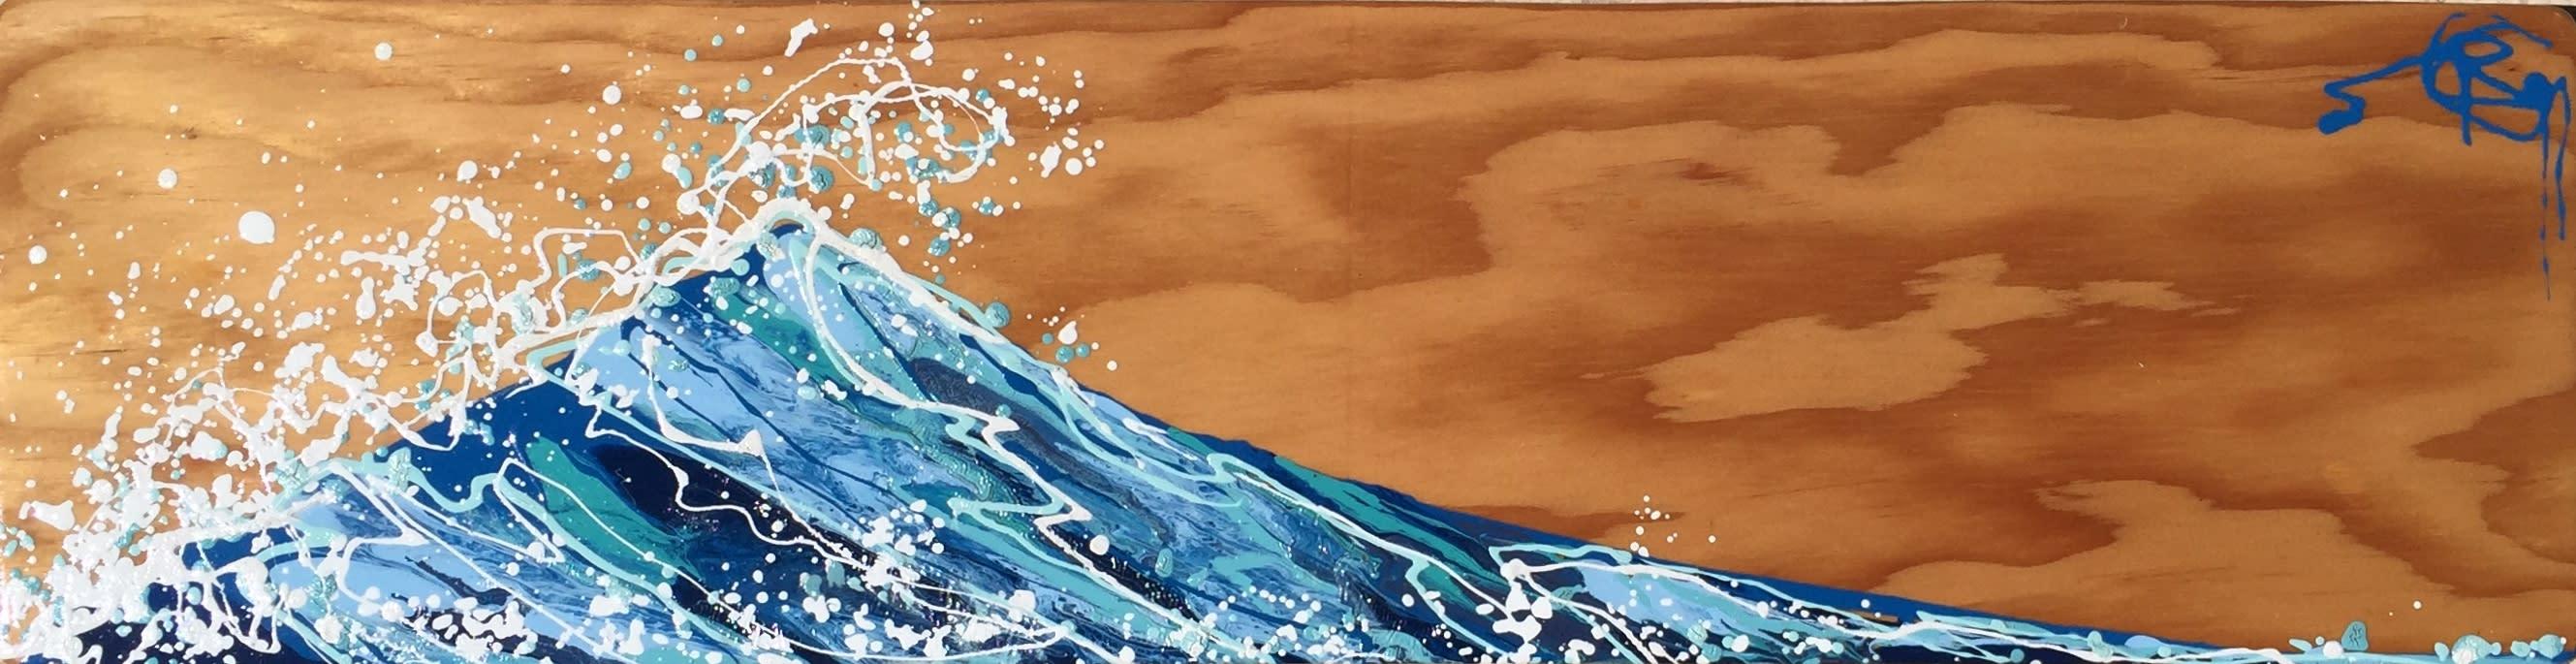 Wave of joy natural 1 8x30  d3kno8